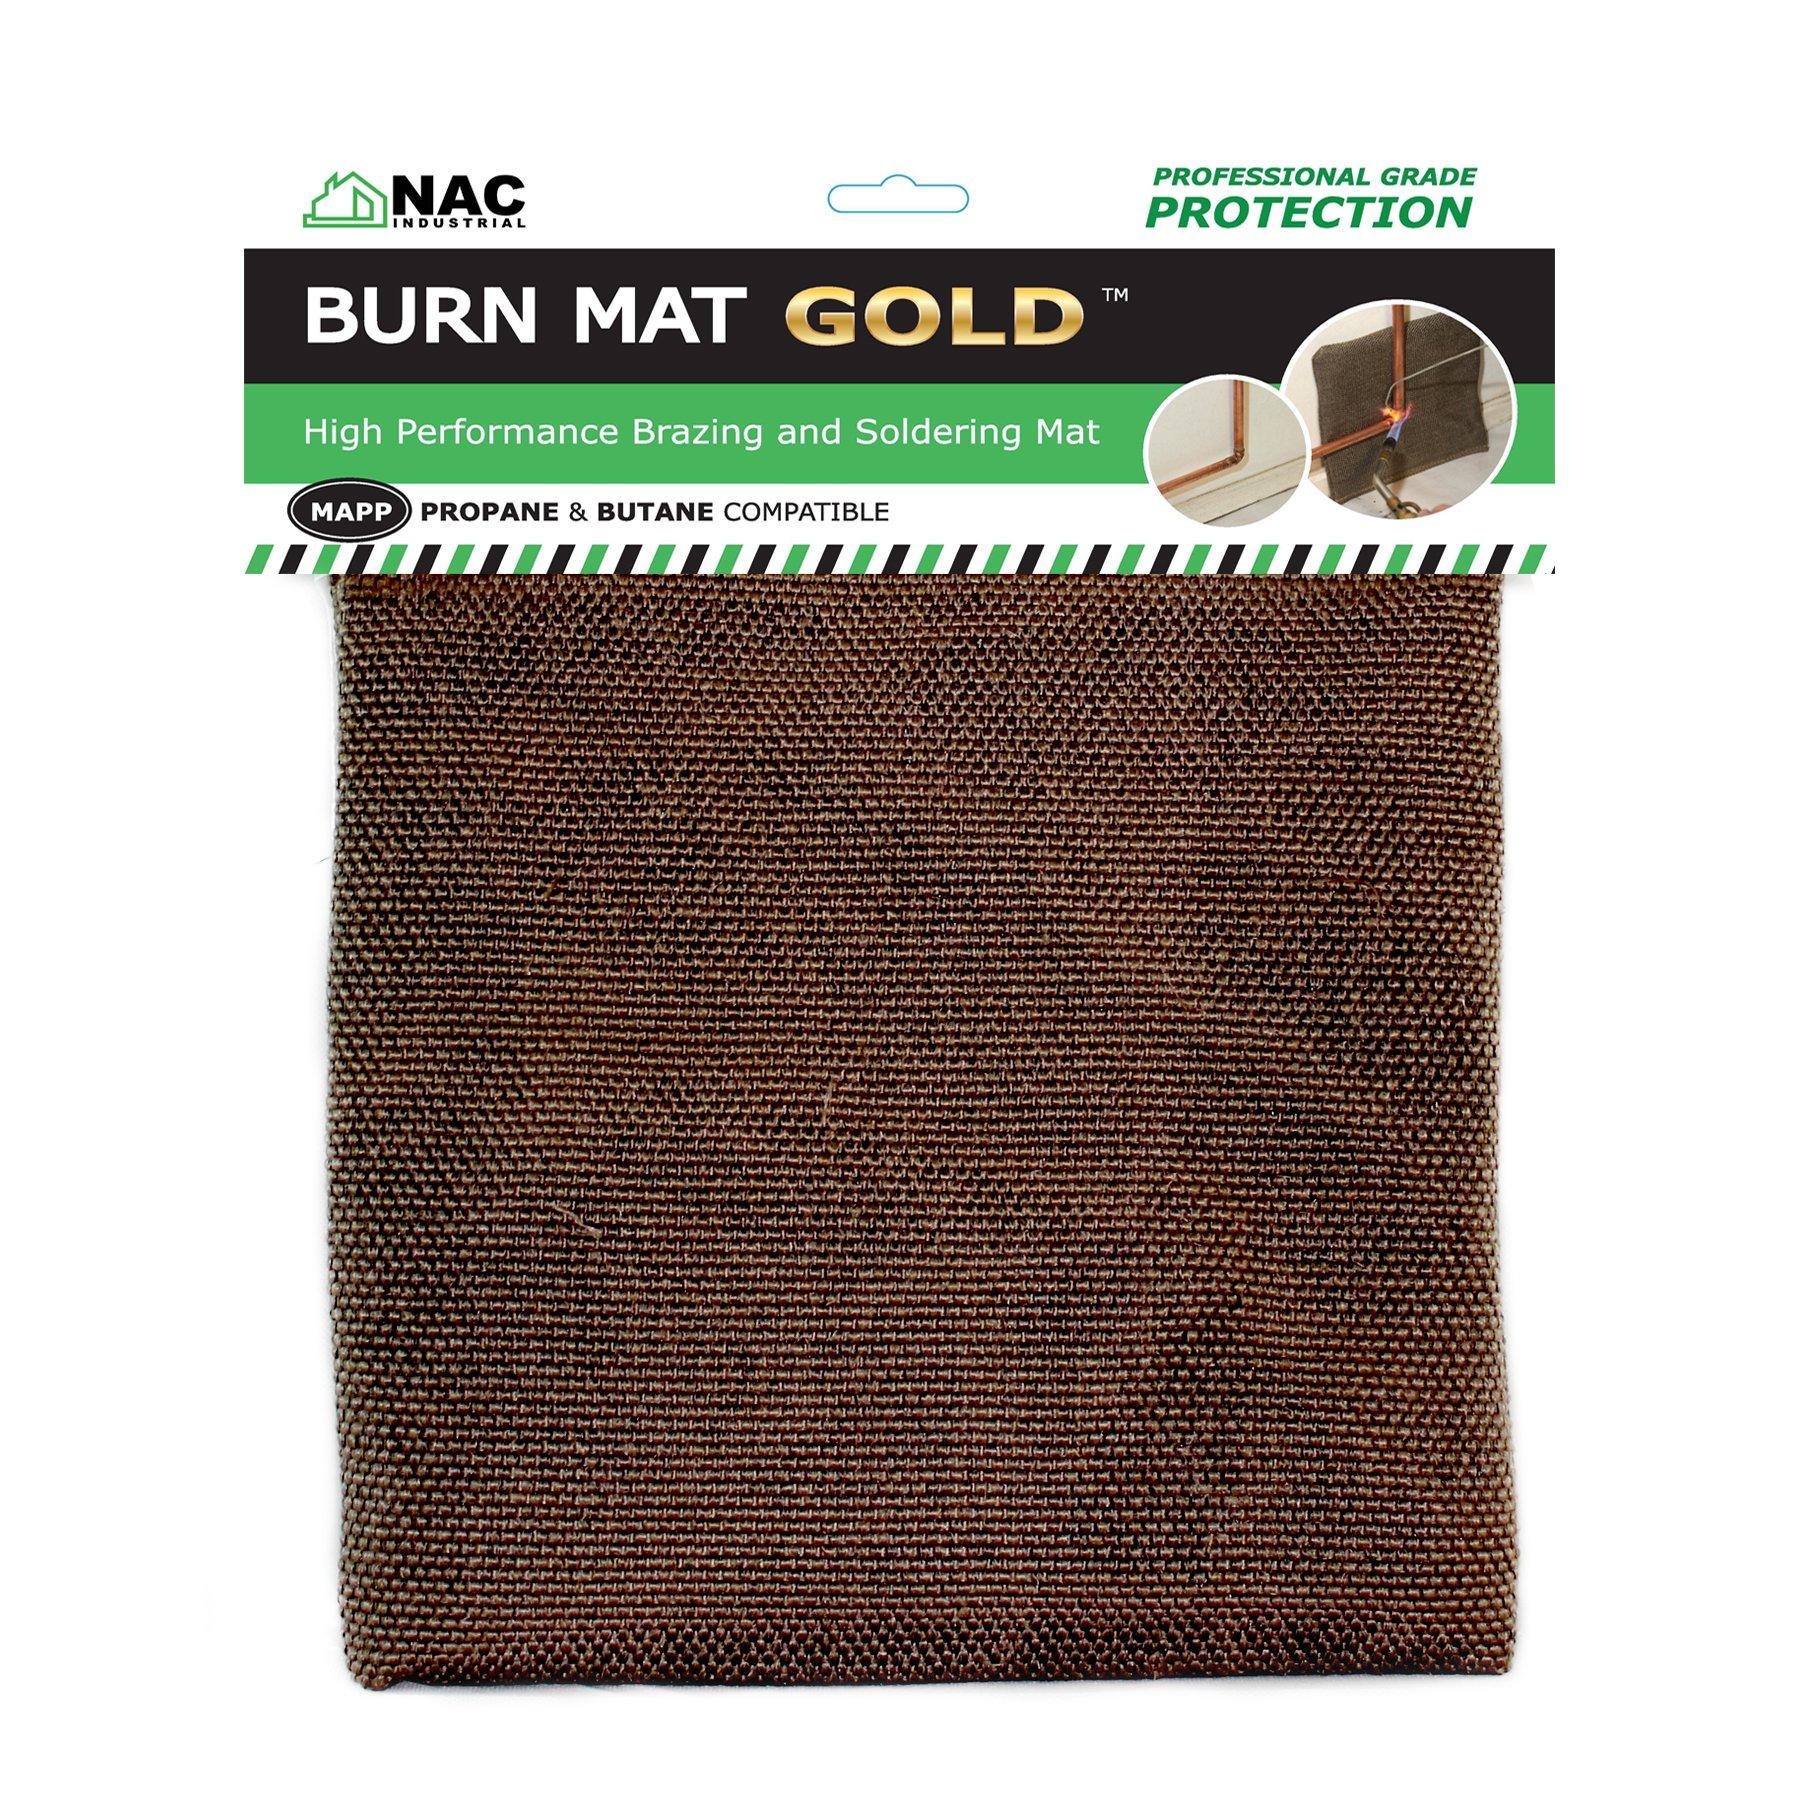 NAC INDUSTRIAL Heat, Fire & Flame Barrier, Heat Resistant Welding Blanket BURN MAT - Kevlar Fabric Heat Shield (GOLD) by NAC INDUSTRIAL